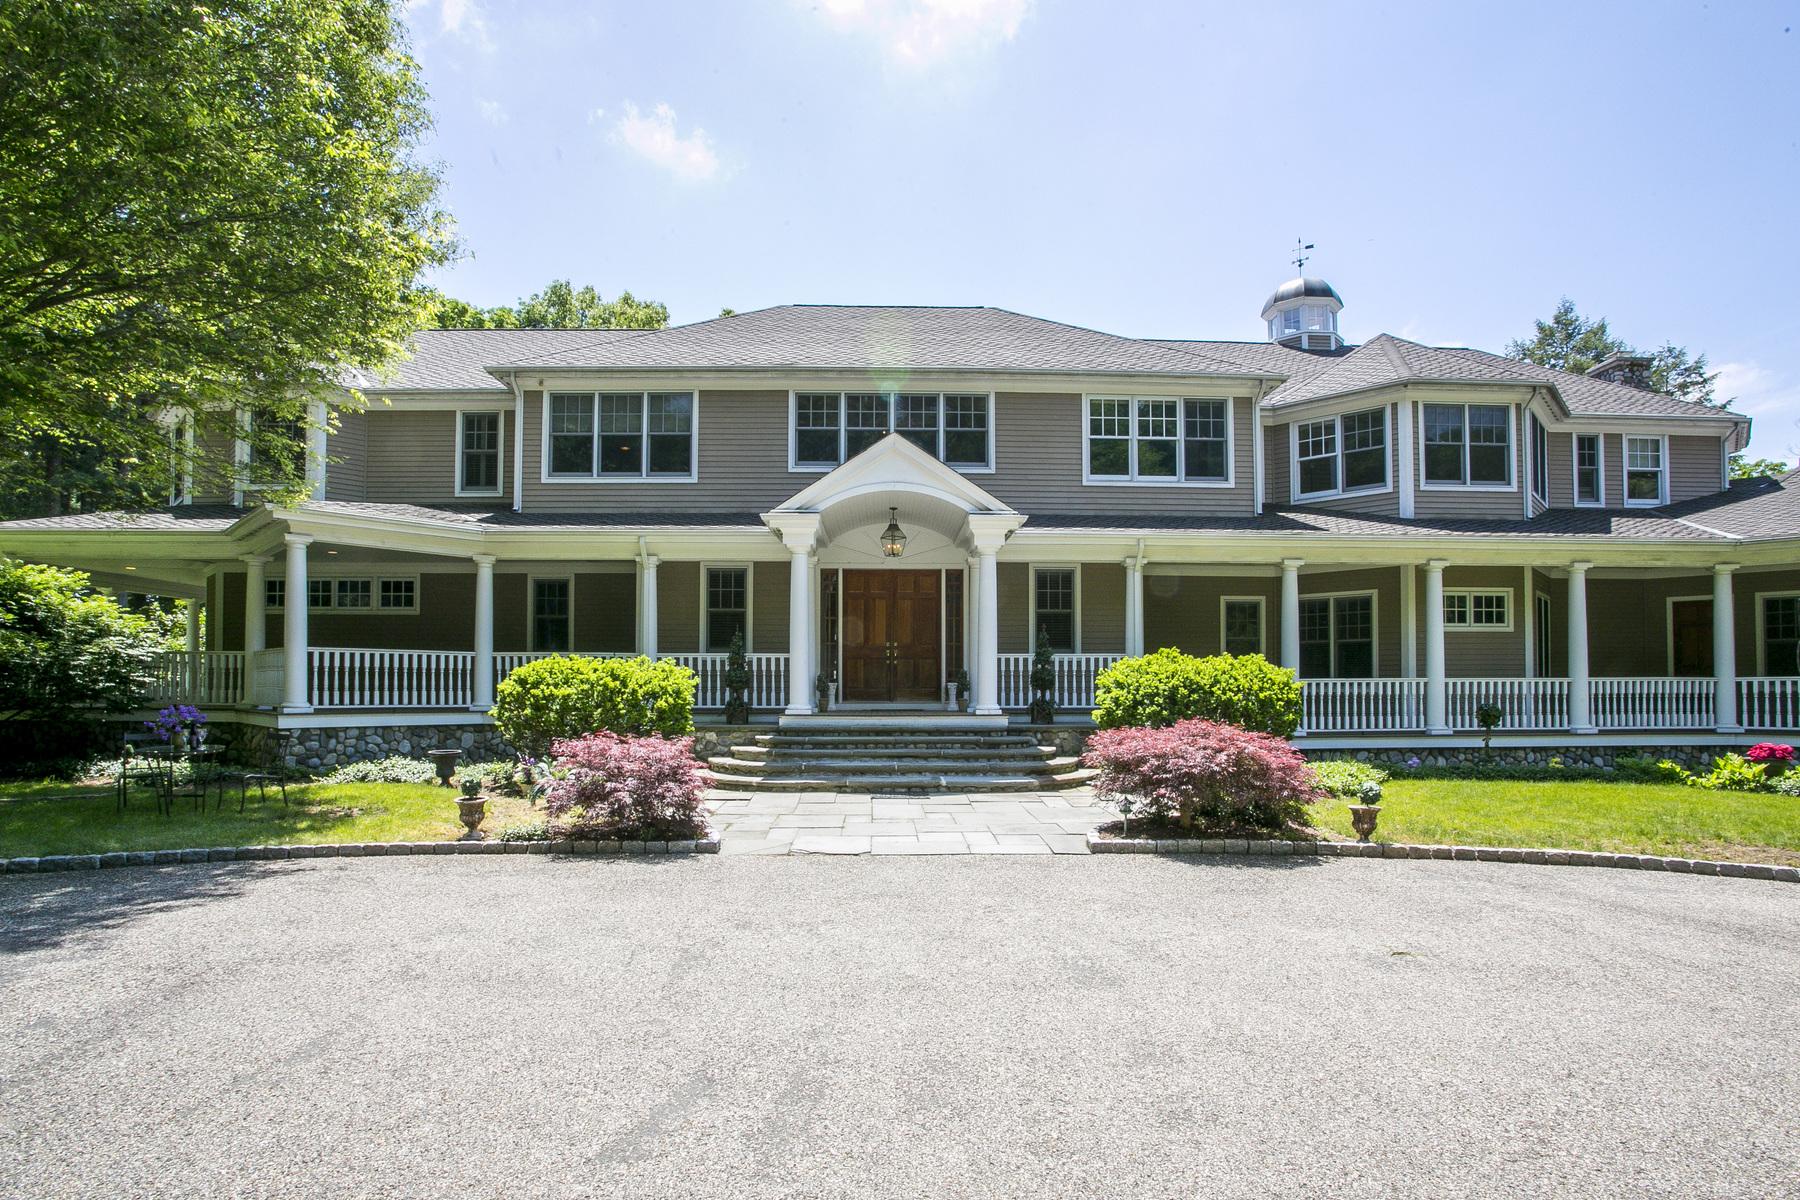 sales property at 7 Woodridge Road, Medfield, MA